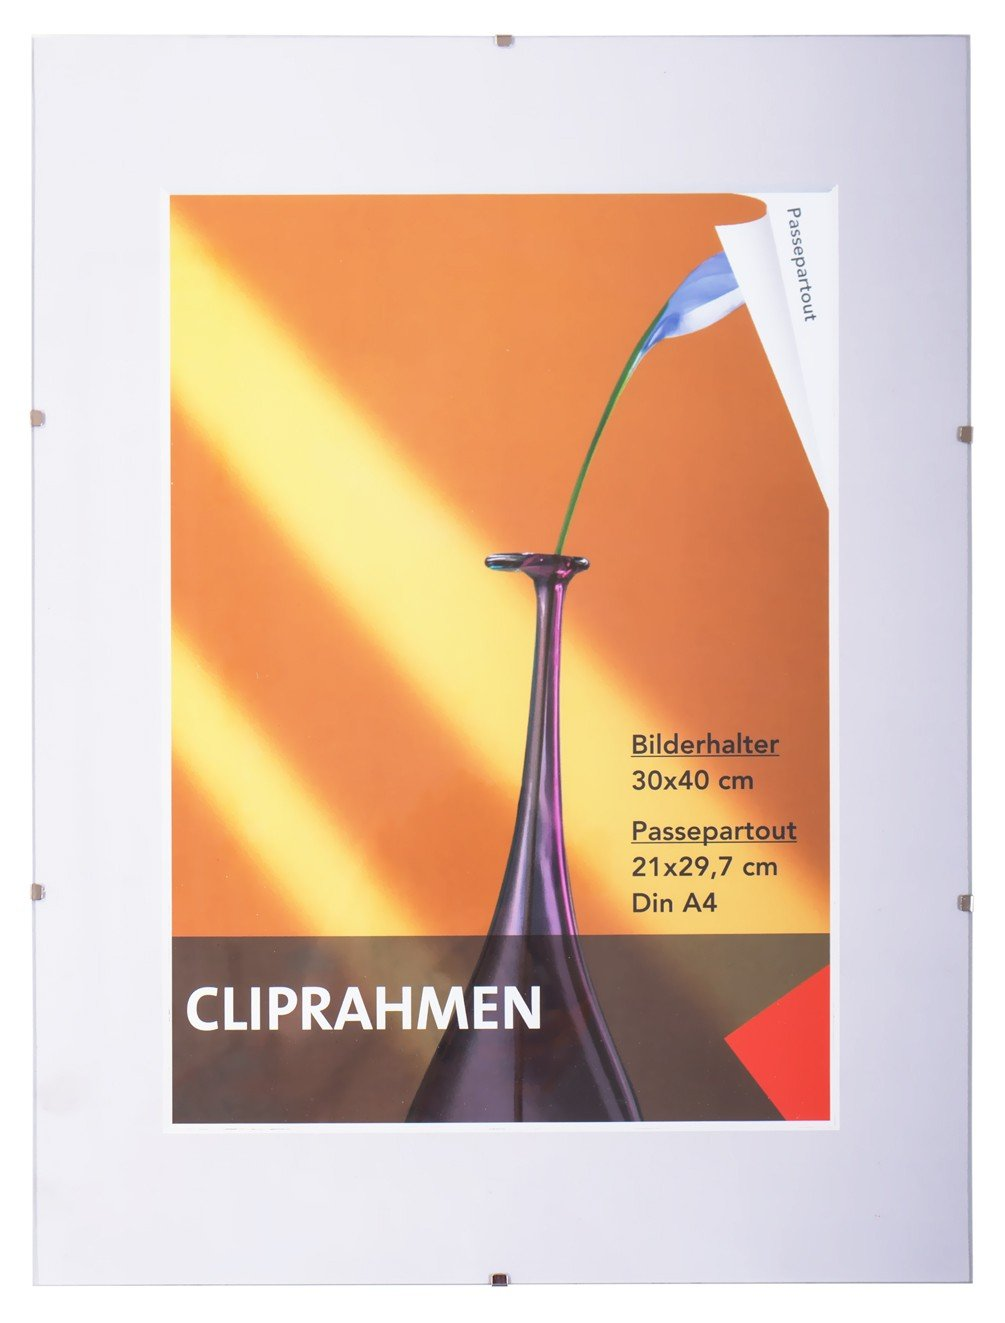 Amazon.de: Rahmenlos Bilderhalter Bilderrahmen 30x40 cm